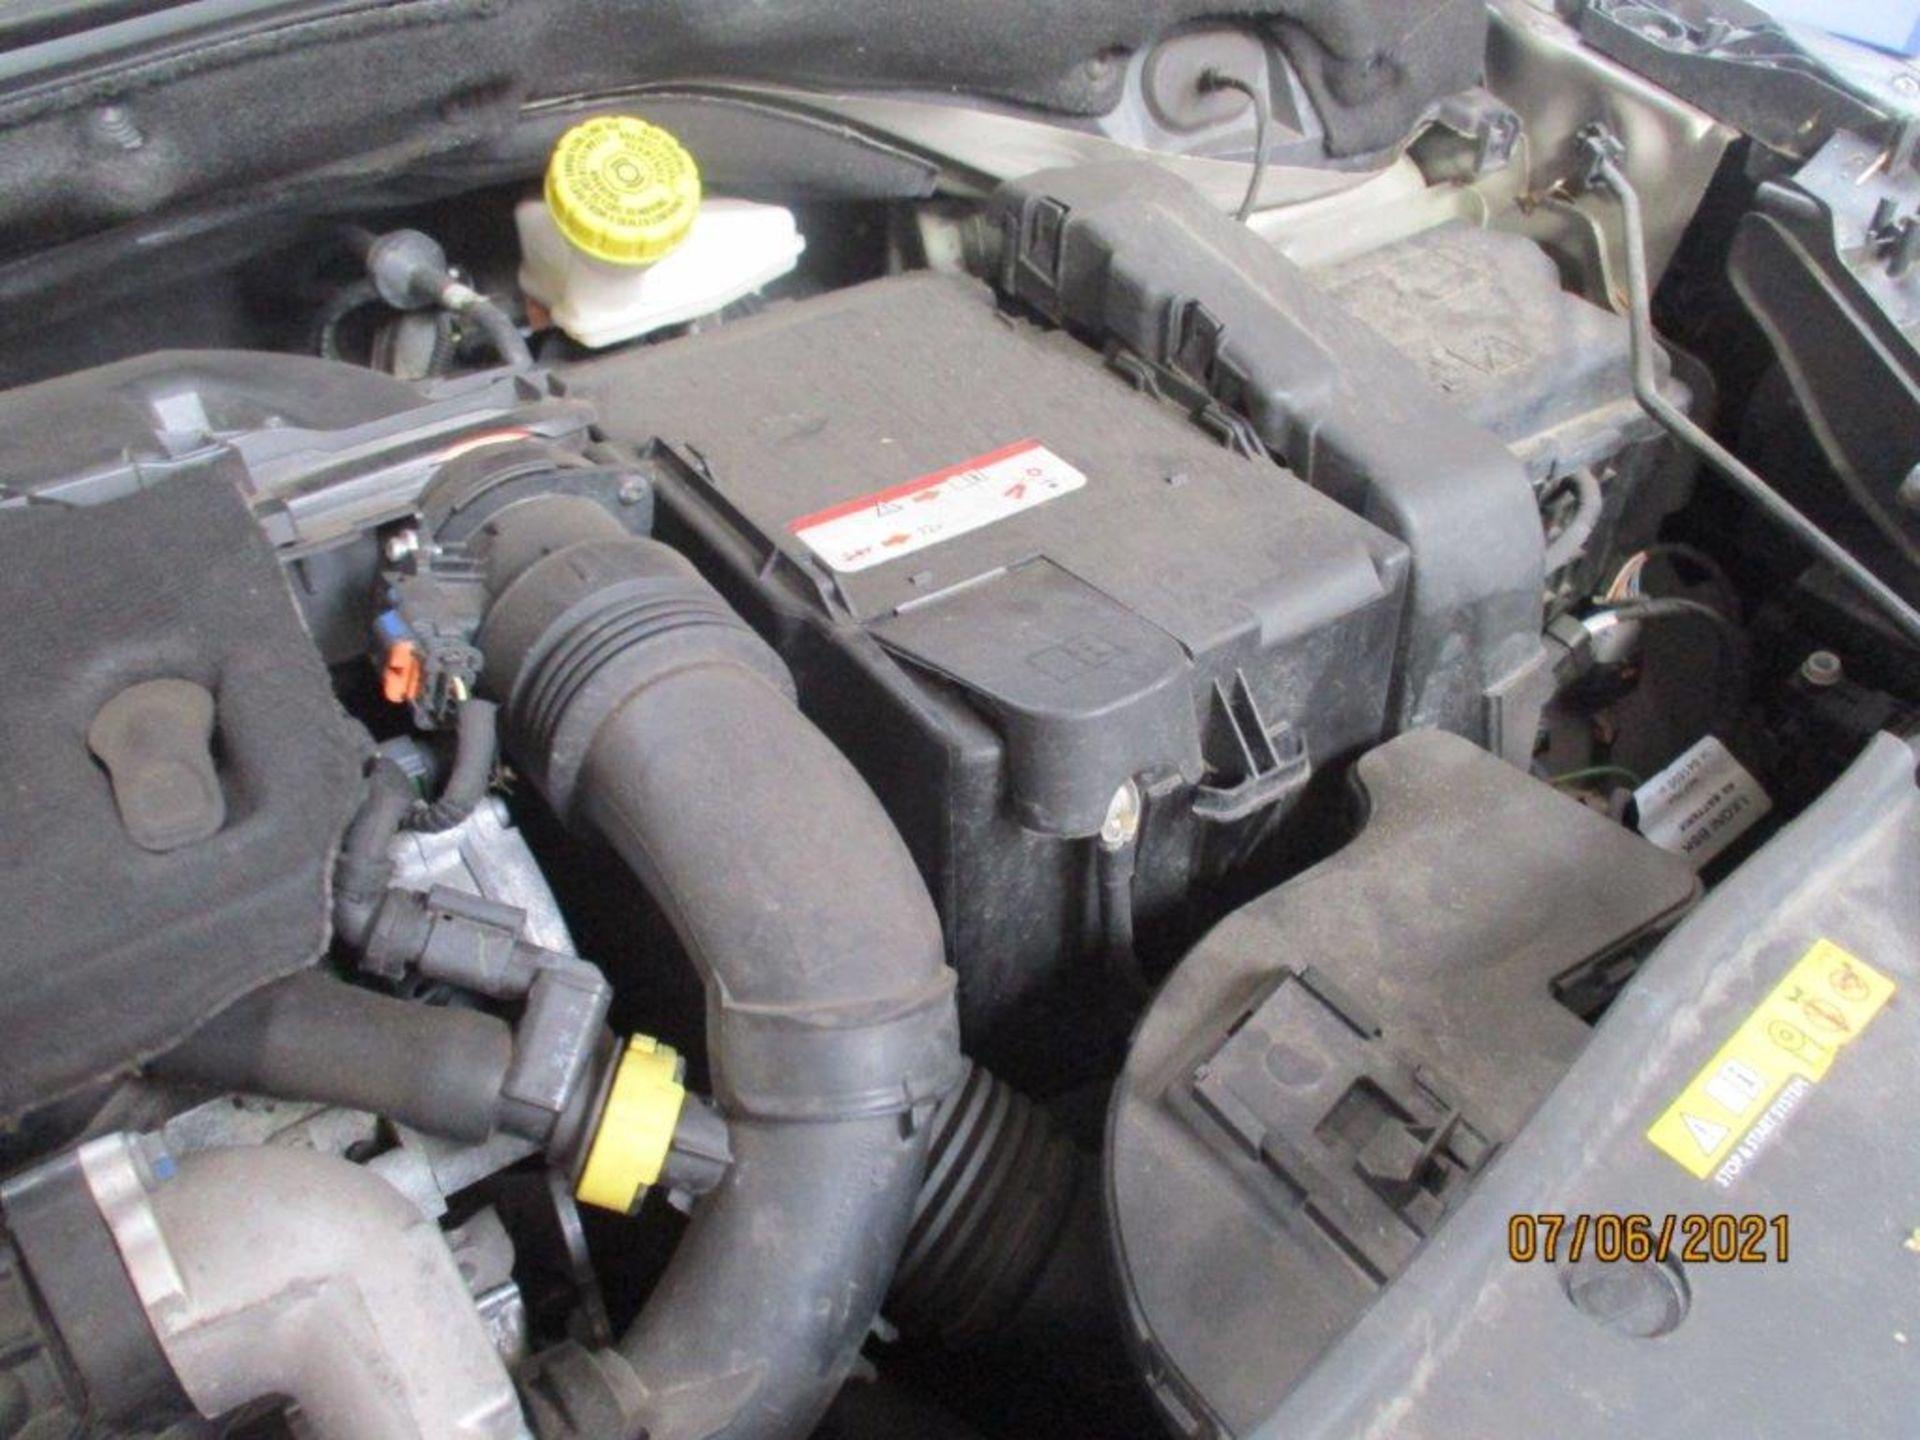 64 15 Peugeot 2008 Allure E-HDI - Image 23 of 25